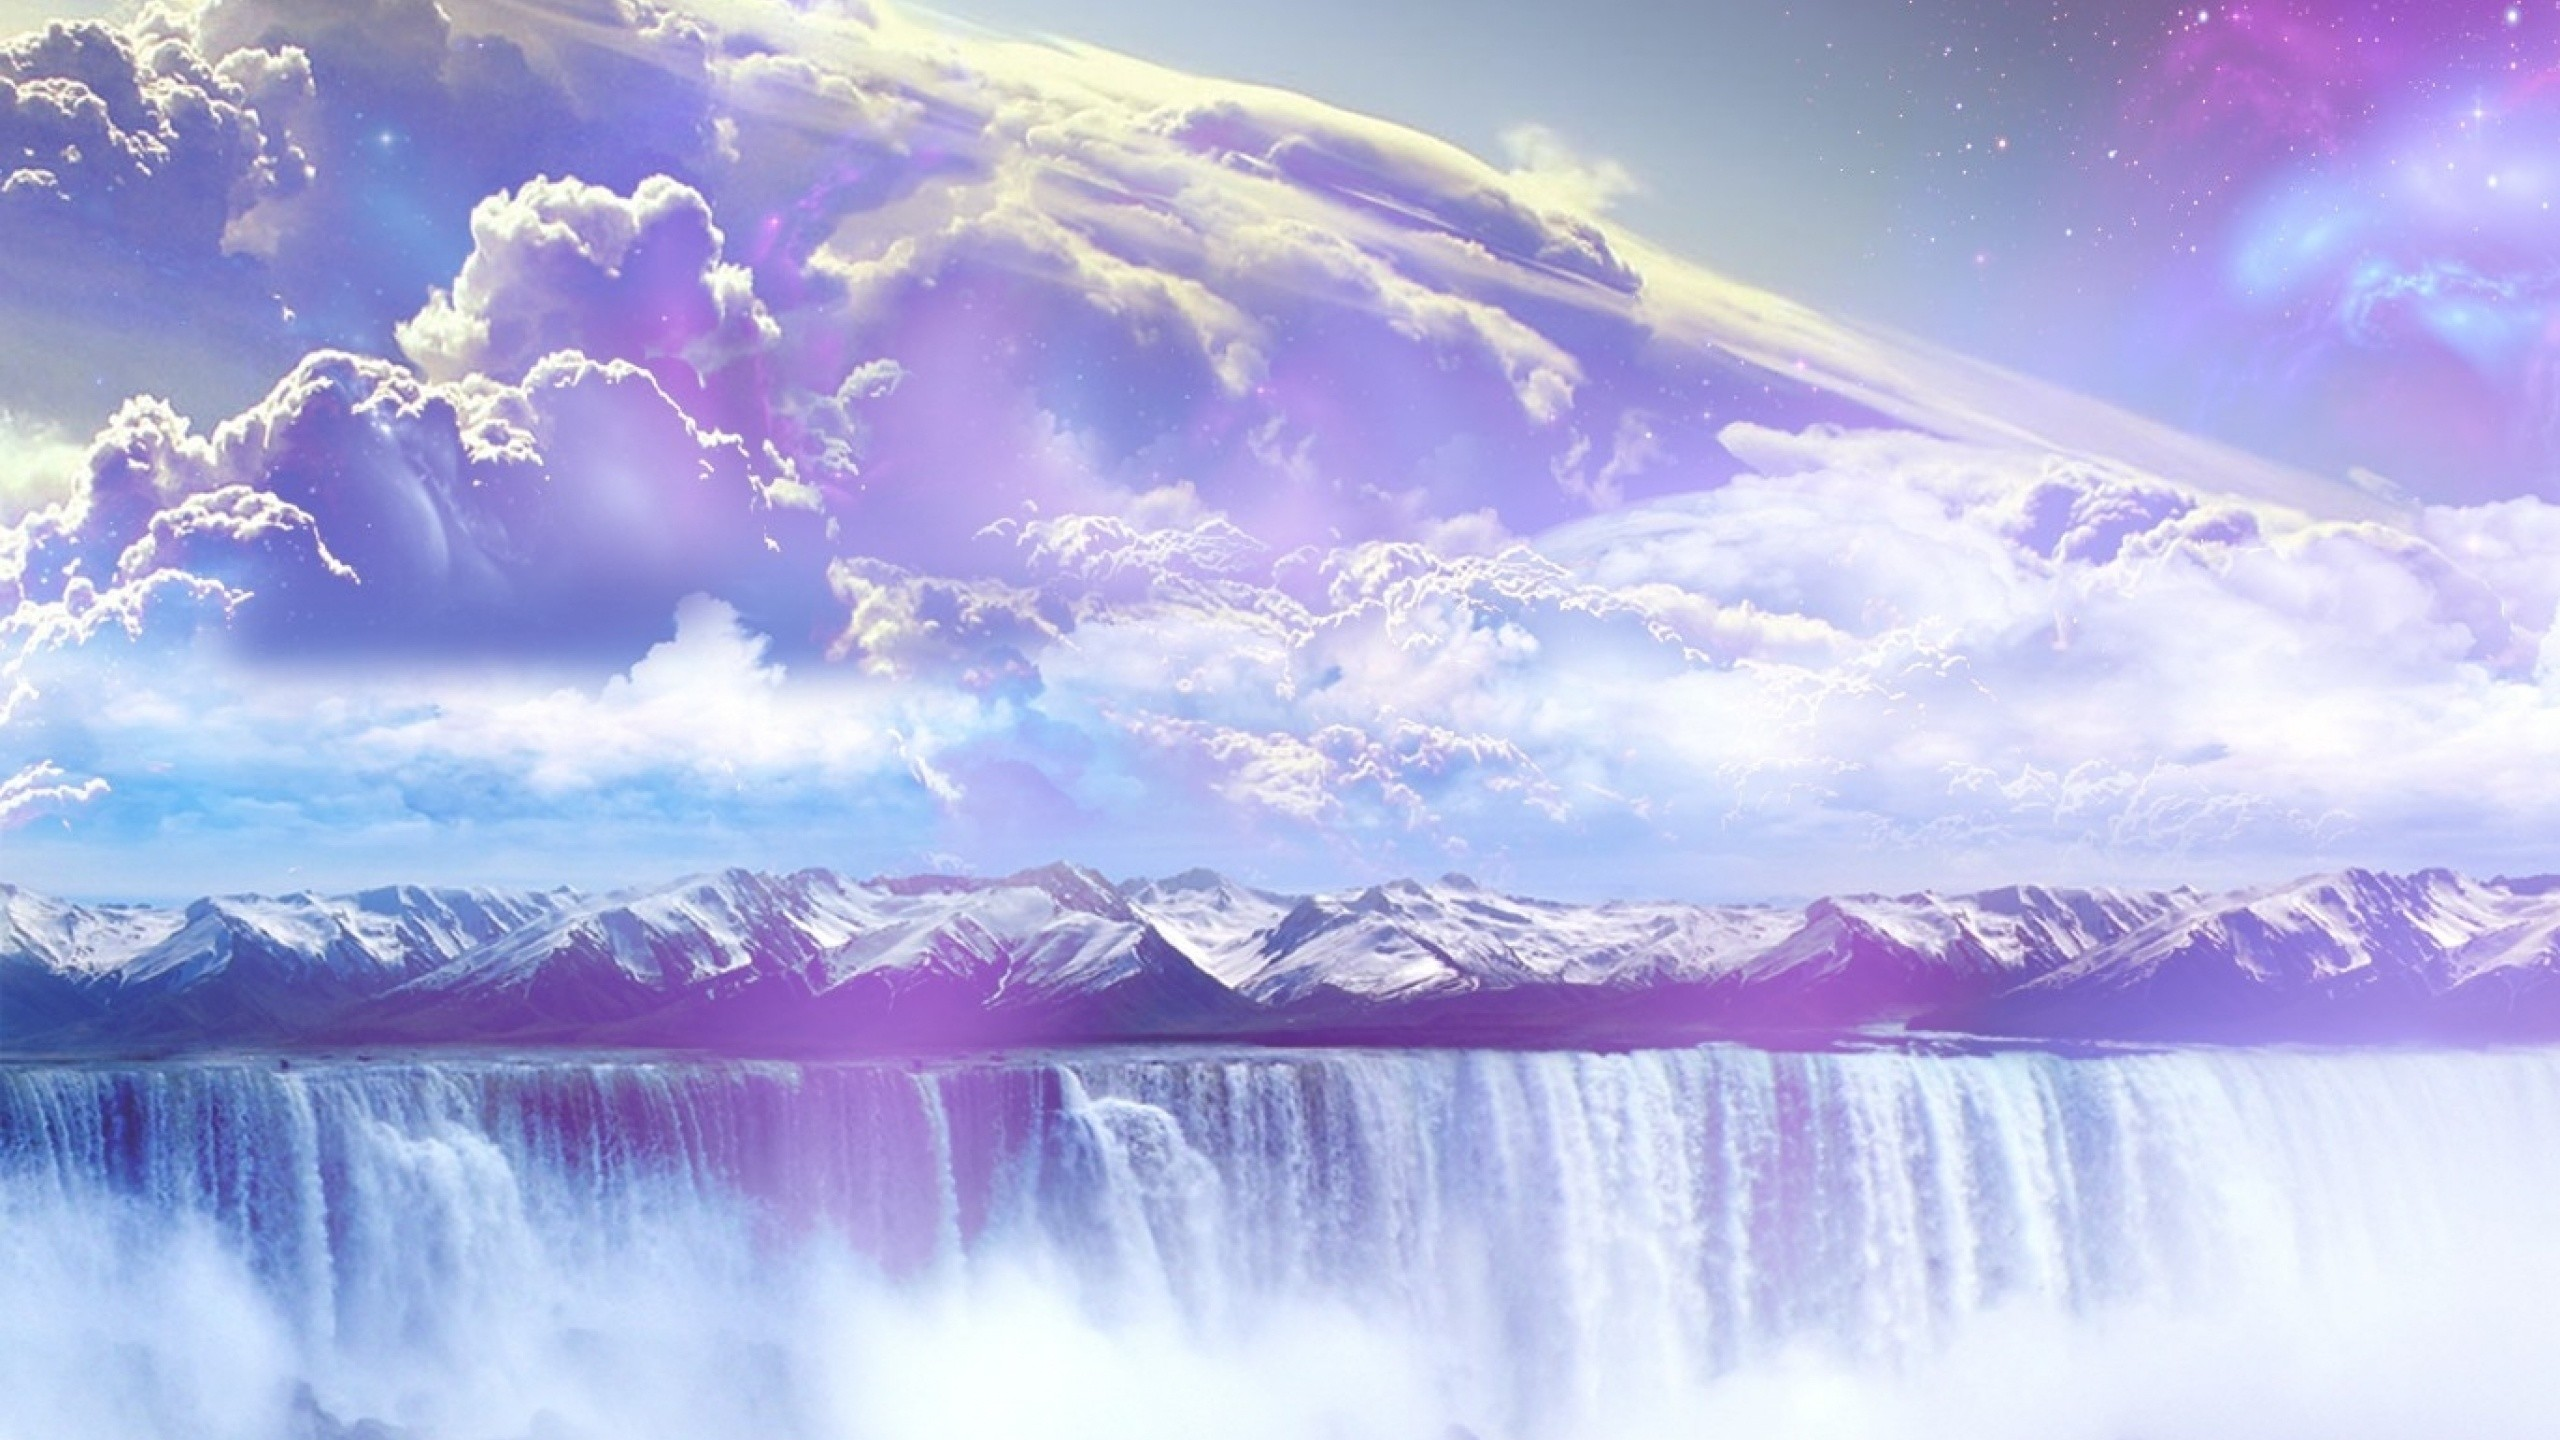 Galaxy Waterfall Mountains Sky desktop PC and Mac wallpaper